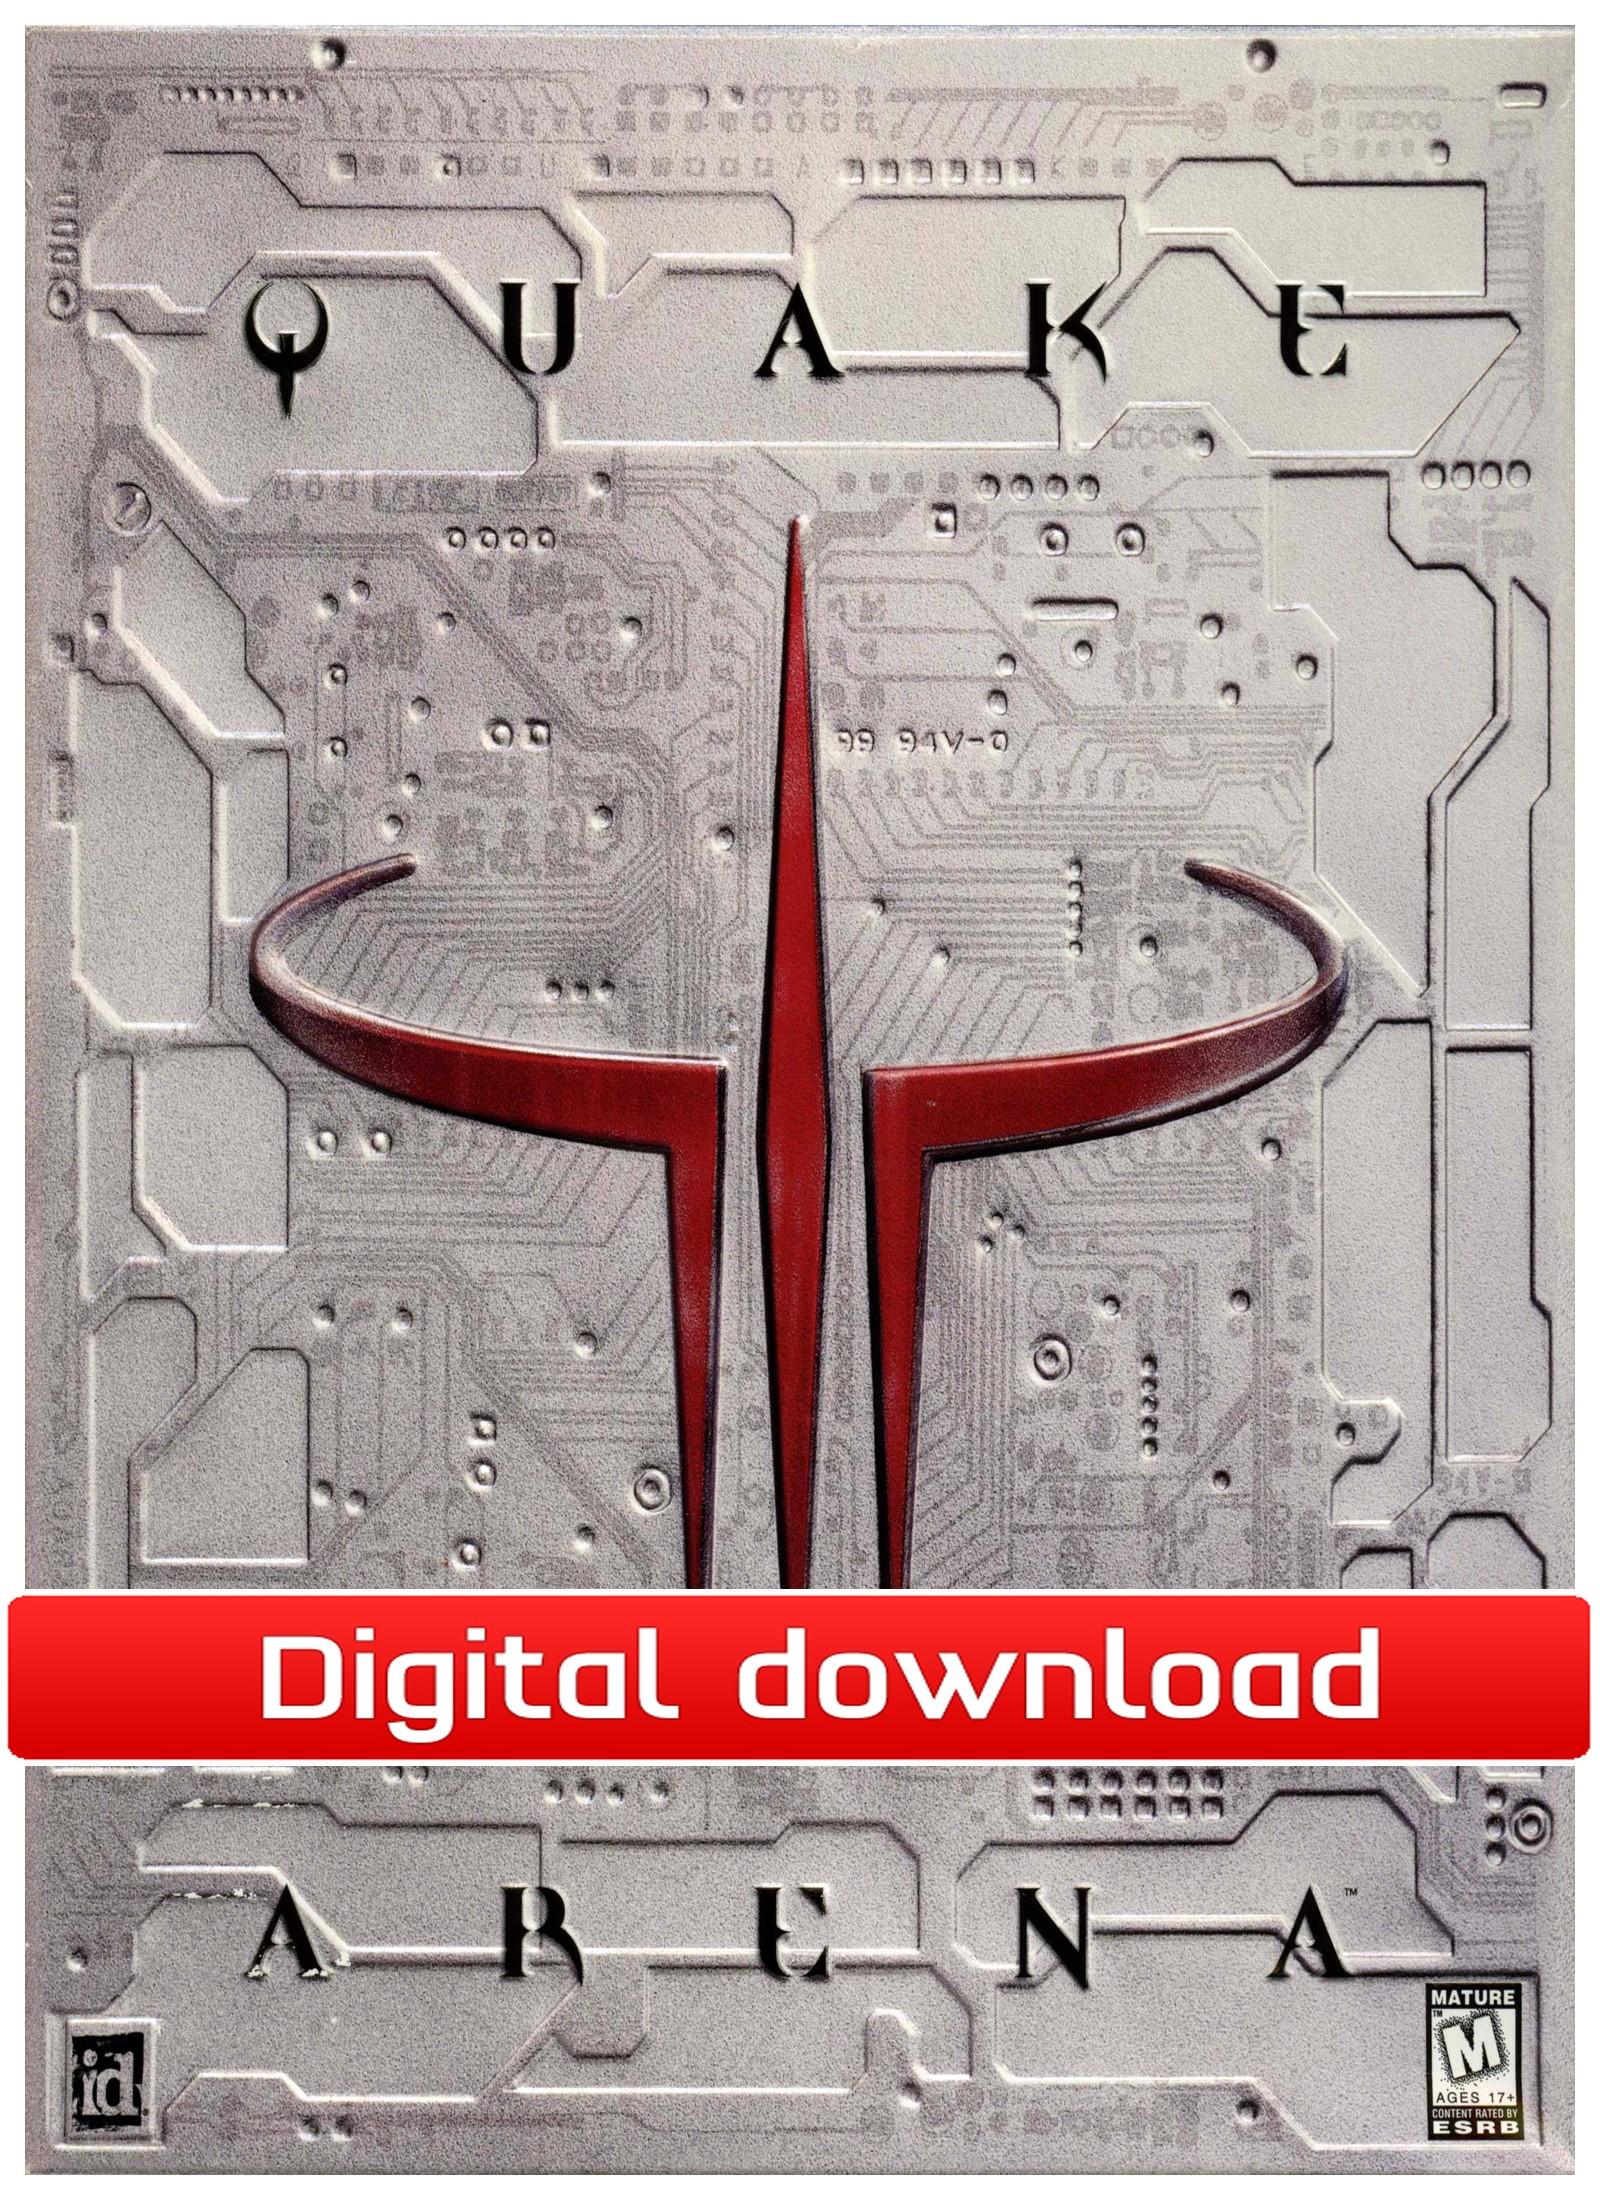 Quake 3 Pack (PC nedlastning) PCDD33377